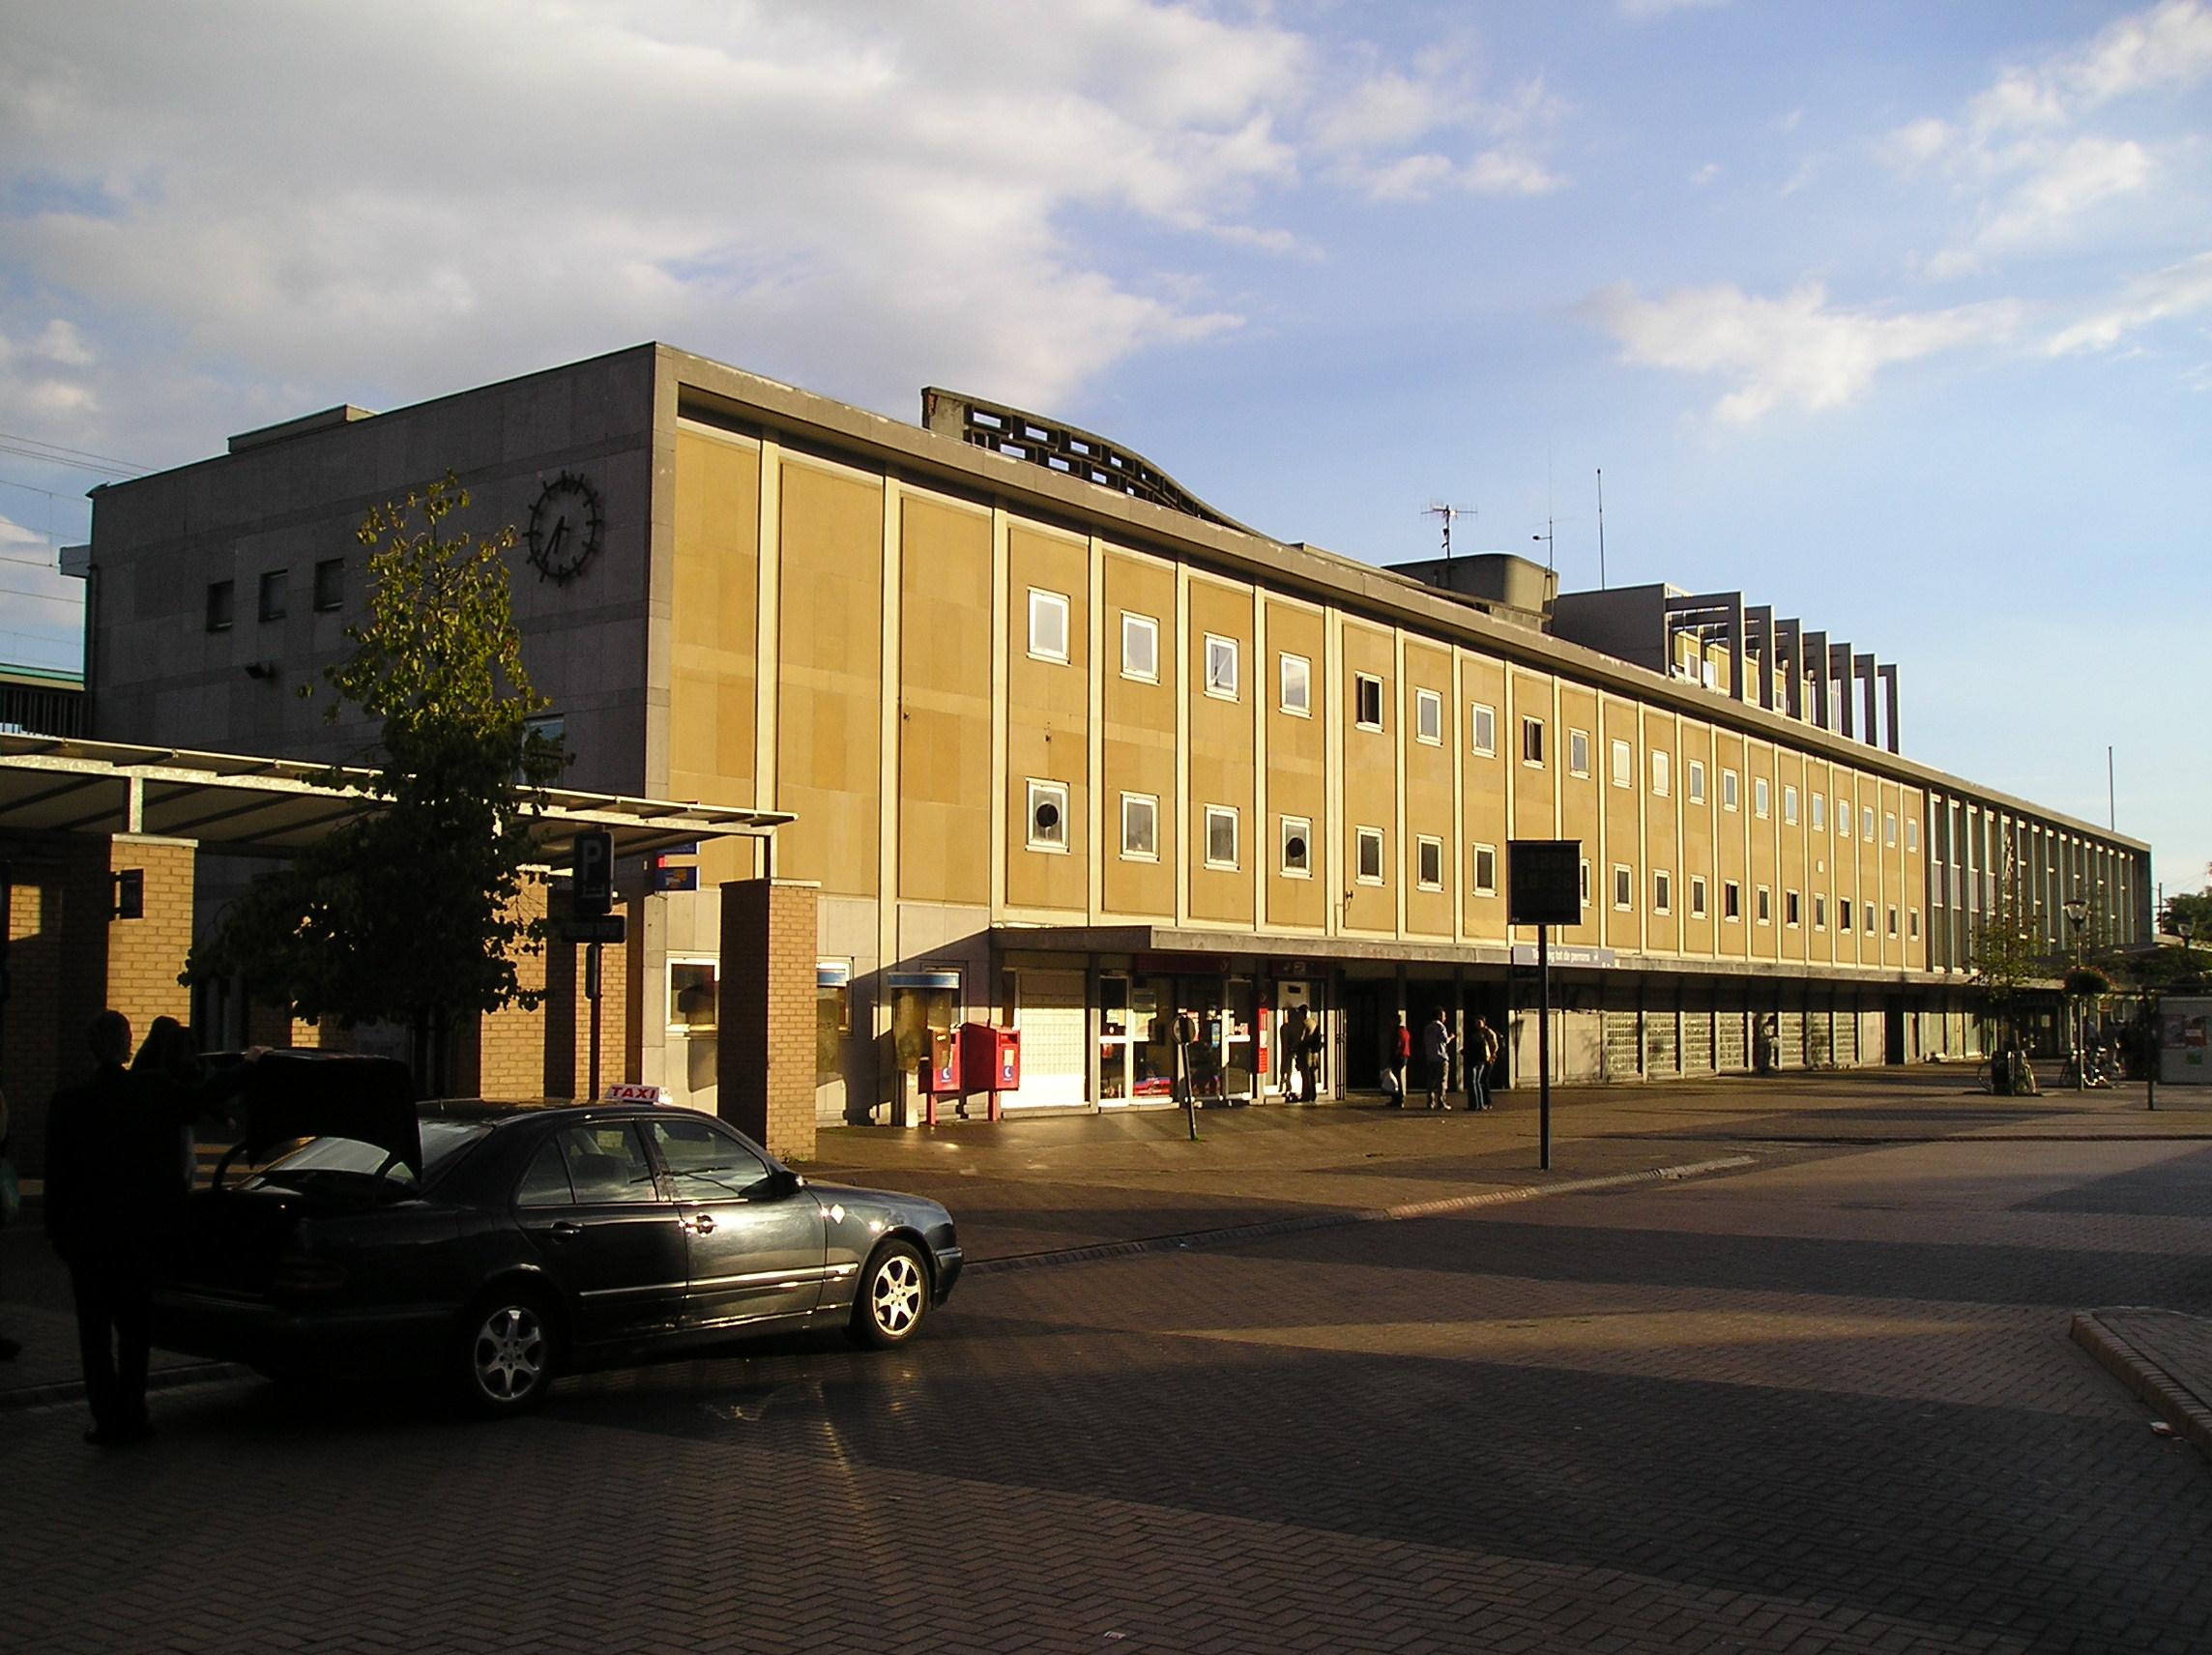 Mechelen railway station - Wikipedia